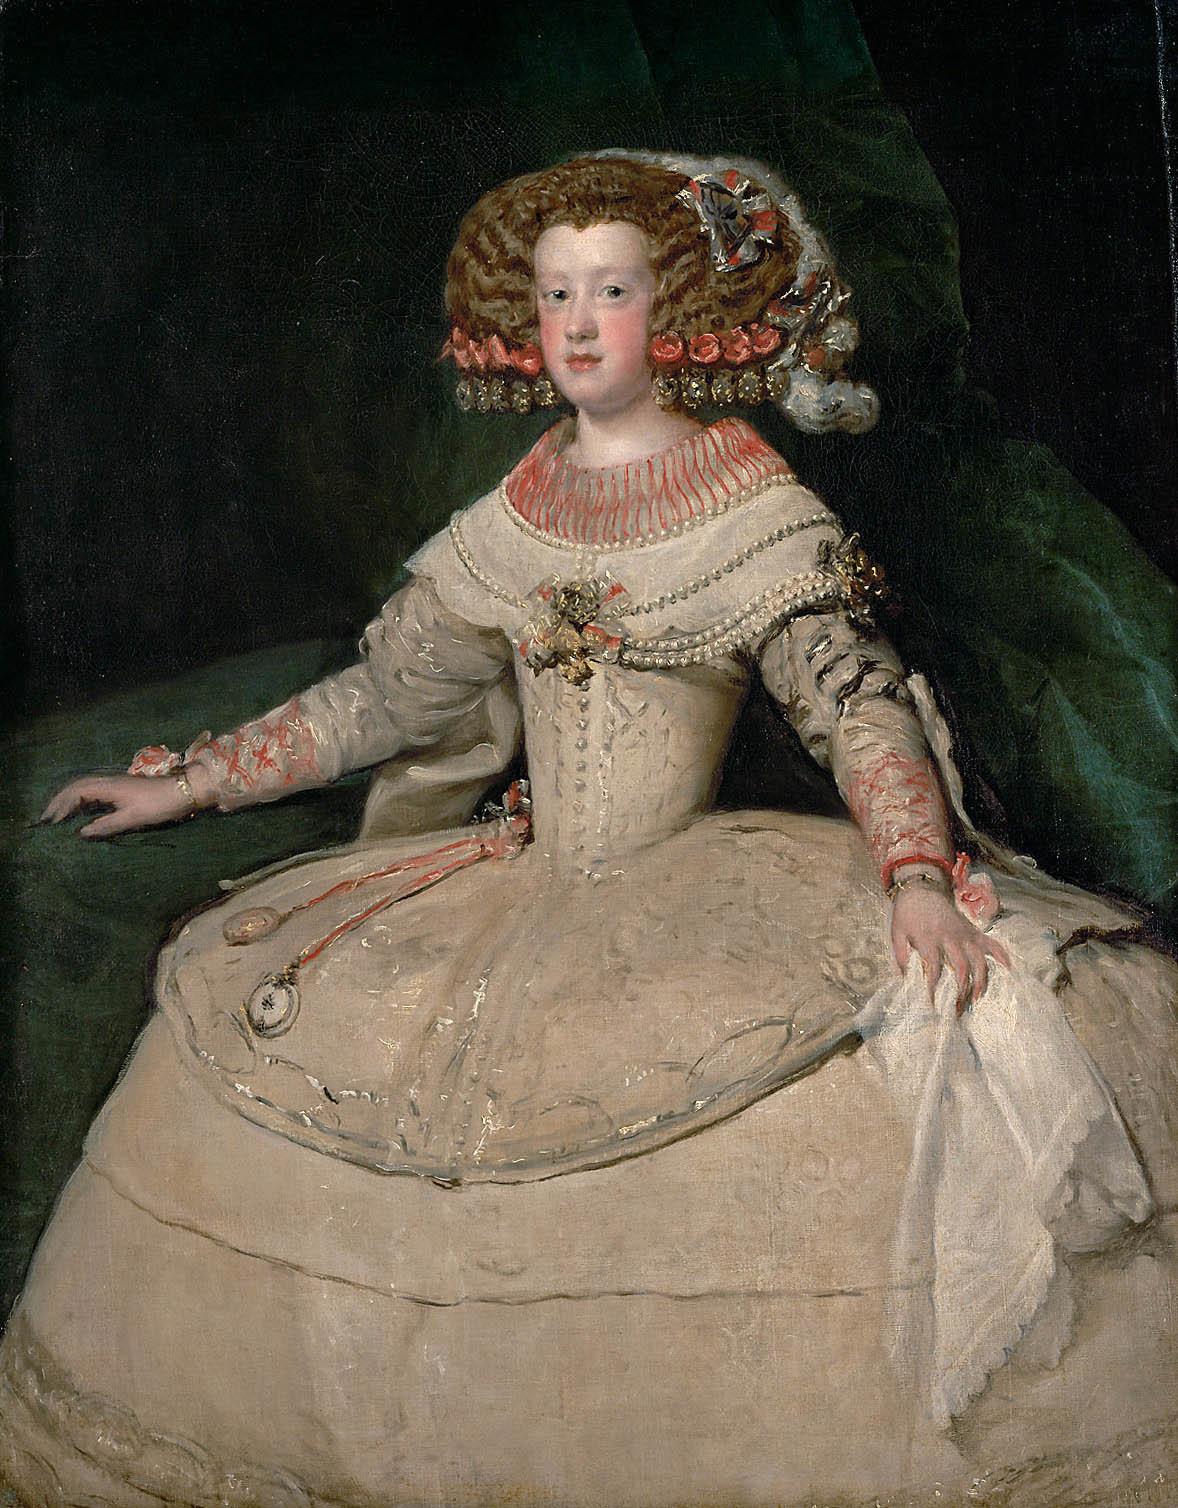 Velaquez ja espanjalainen hovipuku 1660-luvulla.